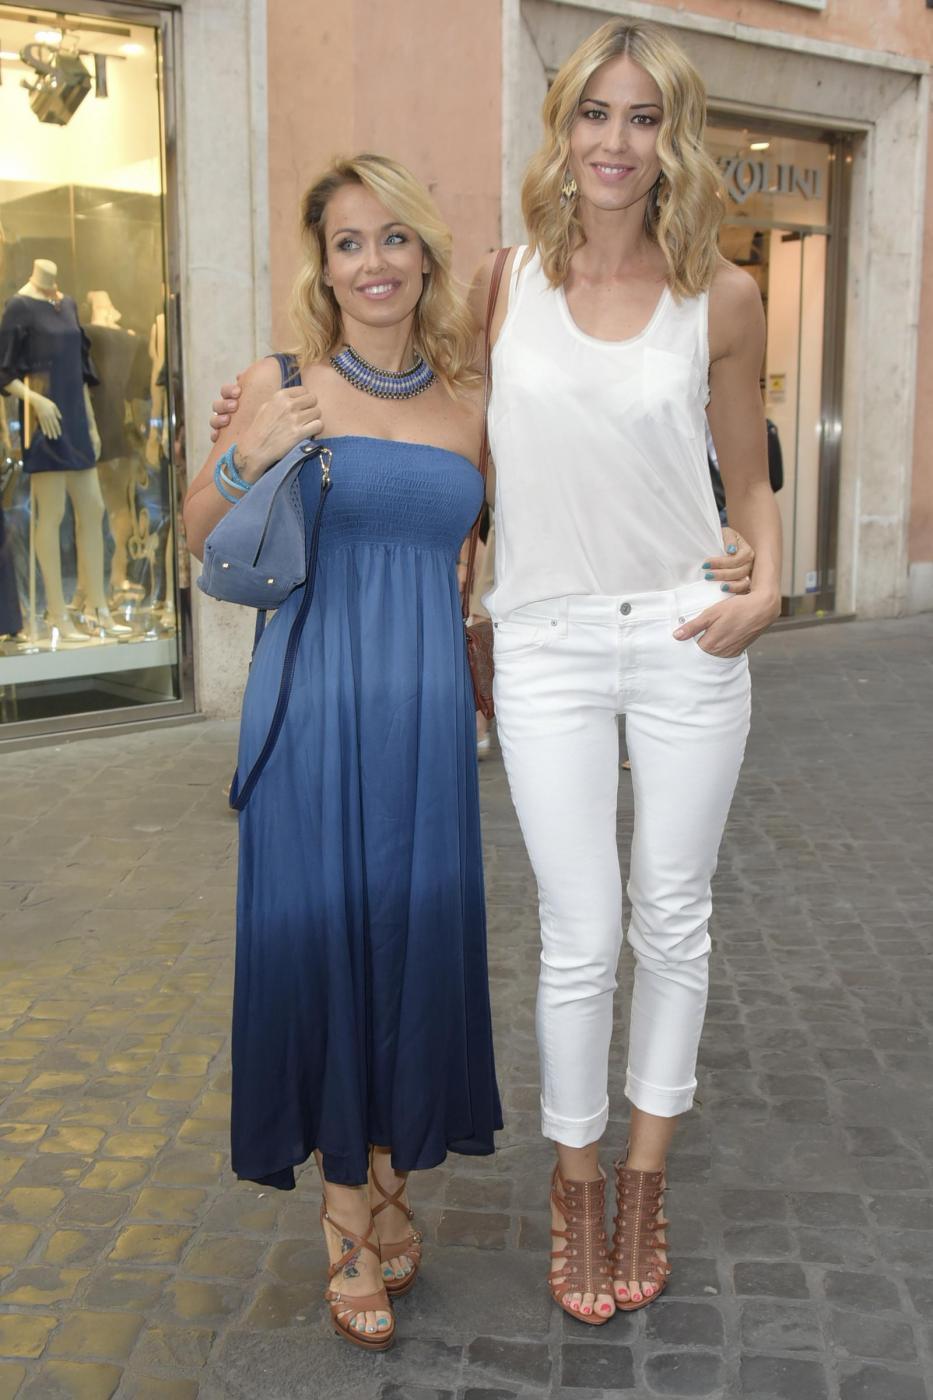 Elena Santarelli, Cristel Carrisi, Sonia Bruganelli, Pamela Prati al party Baldinini 13